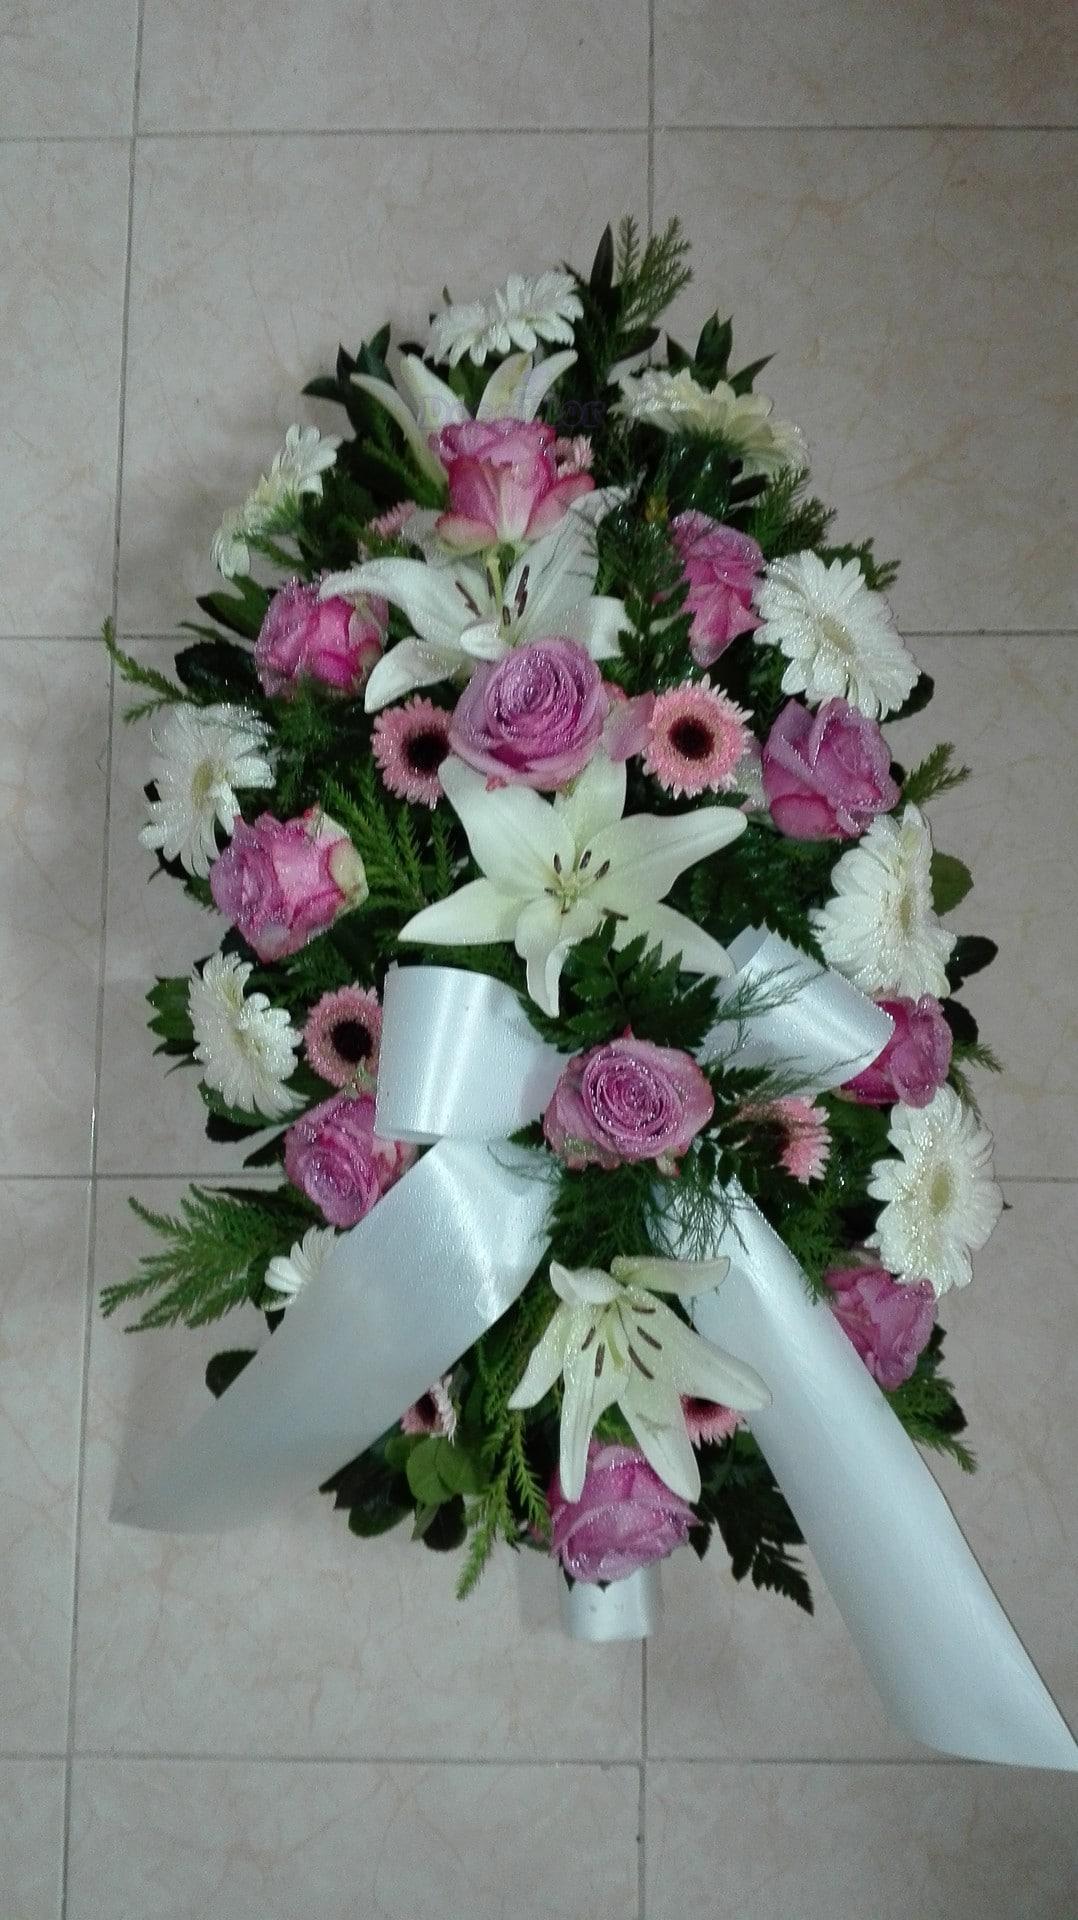 Palma de Funeral em tons branco e rosa